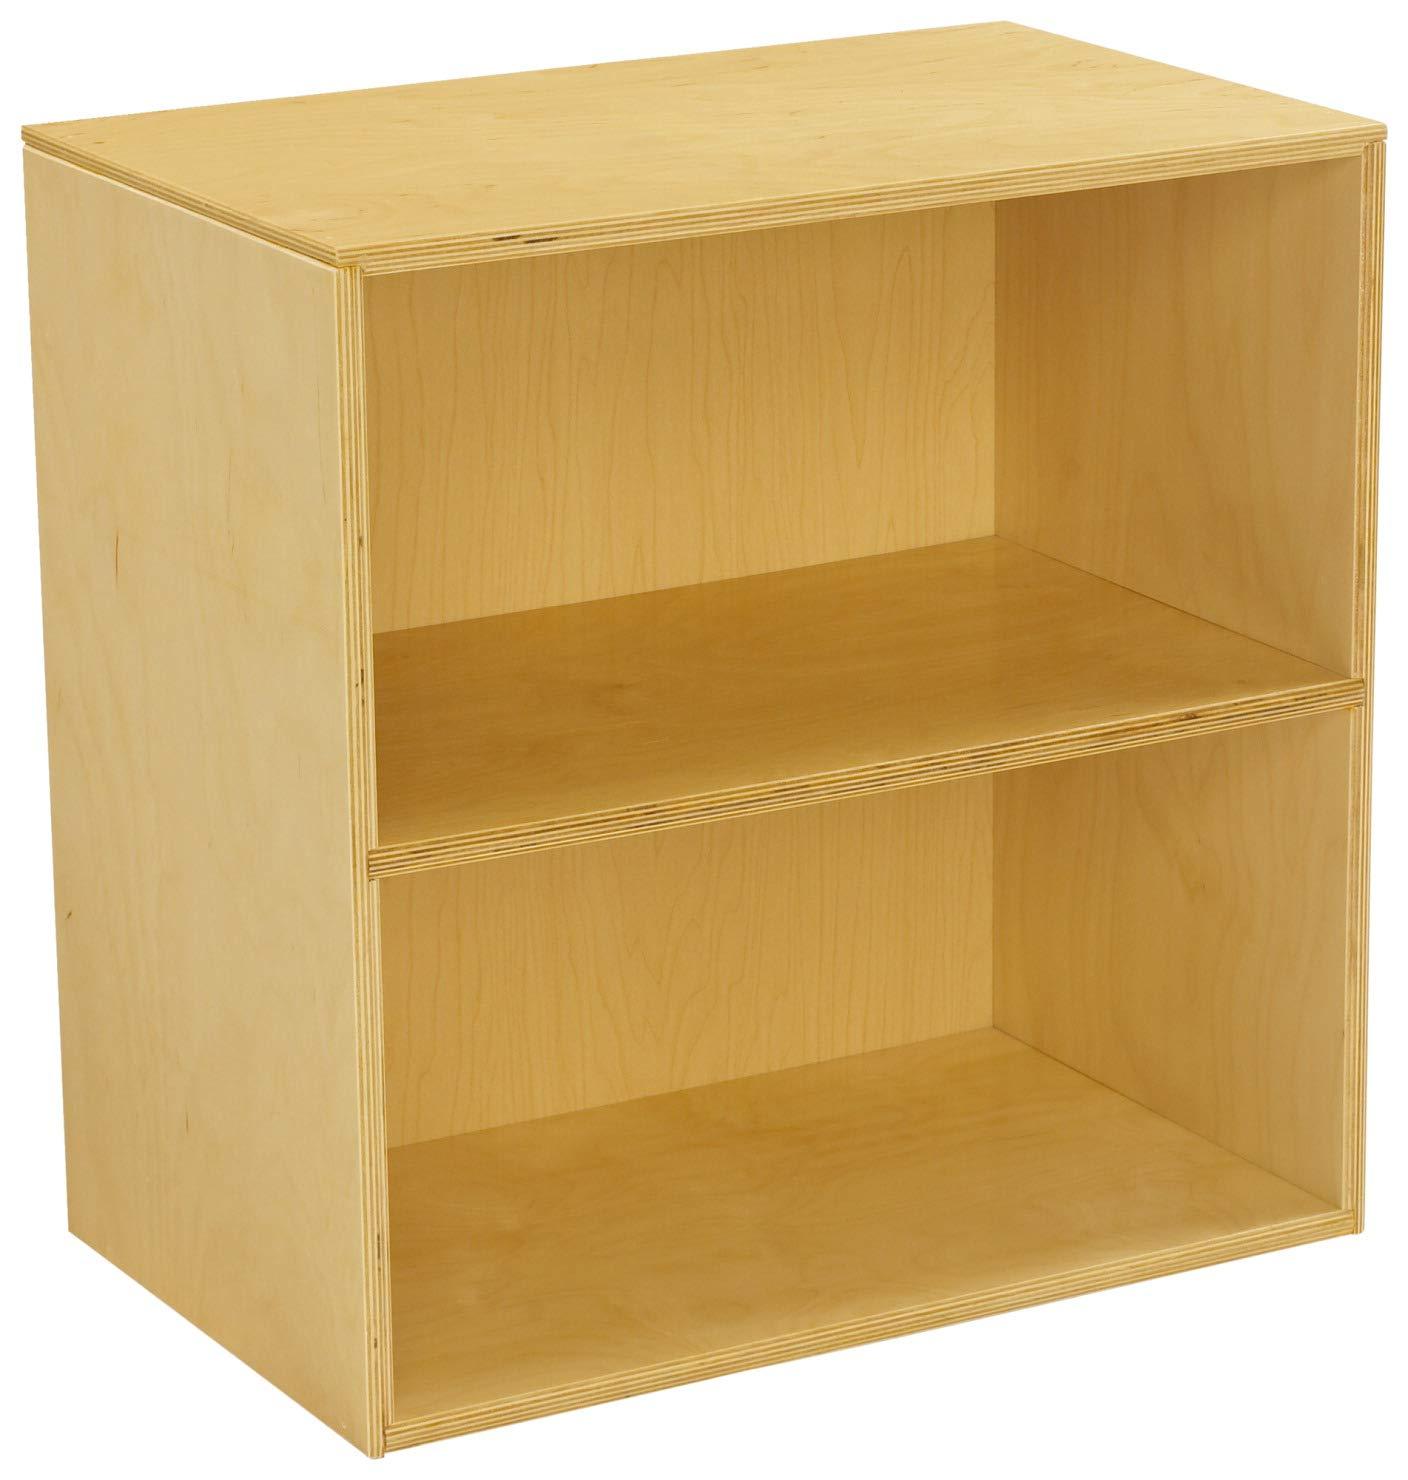 Childcraft Narrow Storage Unit, 2 Shelves, 23-3/4 x 14-3/4 x 24 Inches